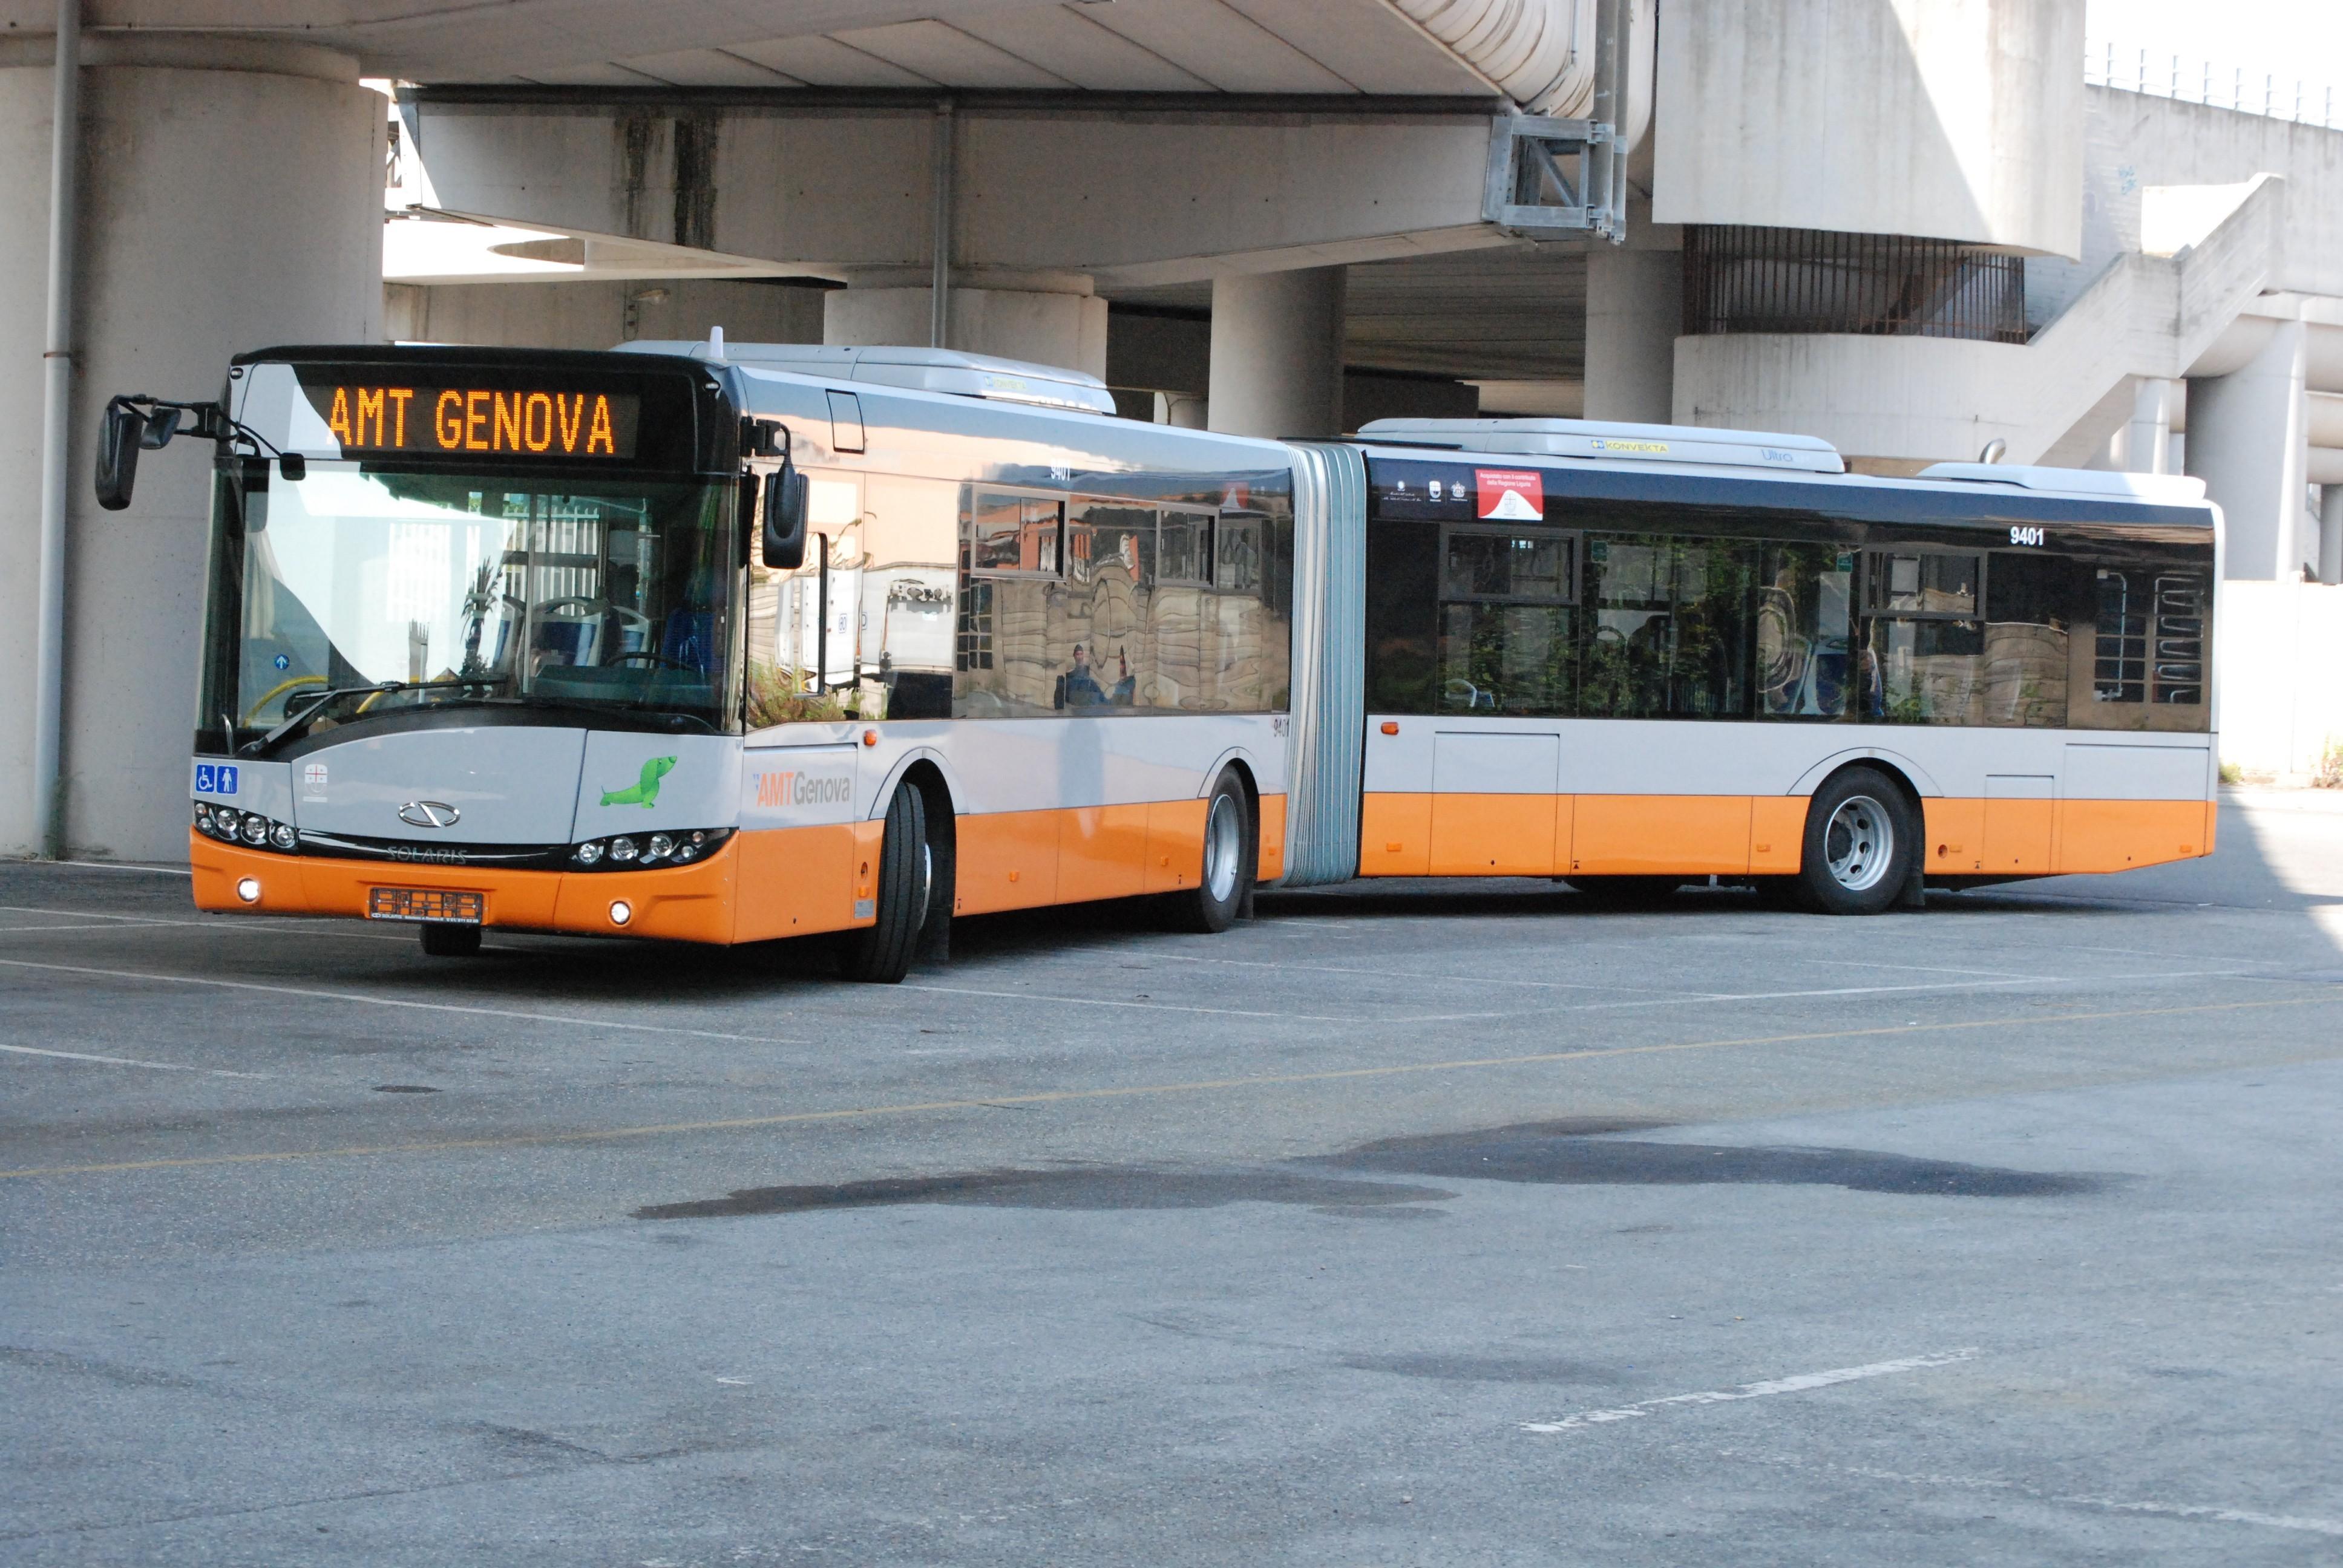 BUS SOLARIS - Foto AMT/Comune di Genova